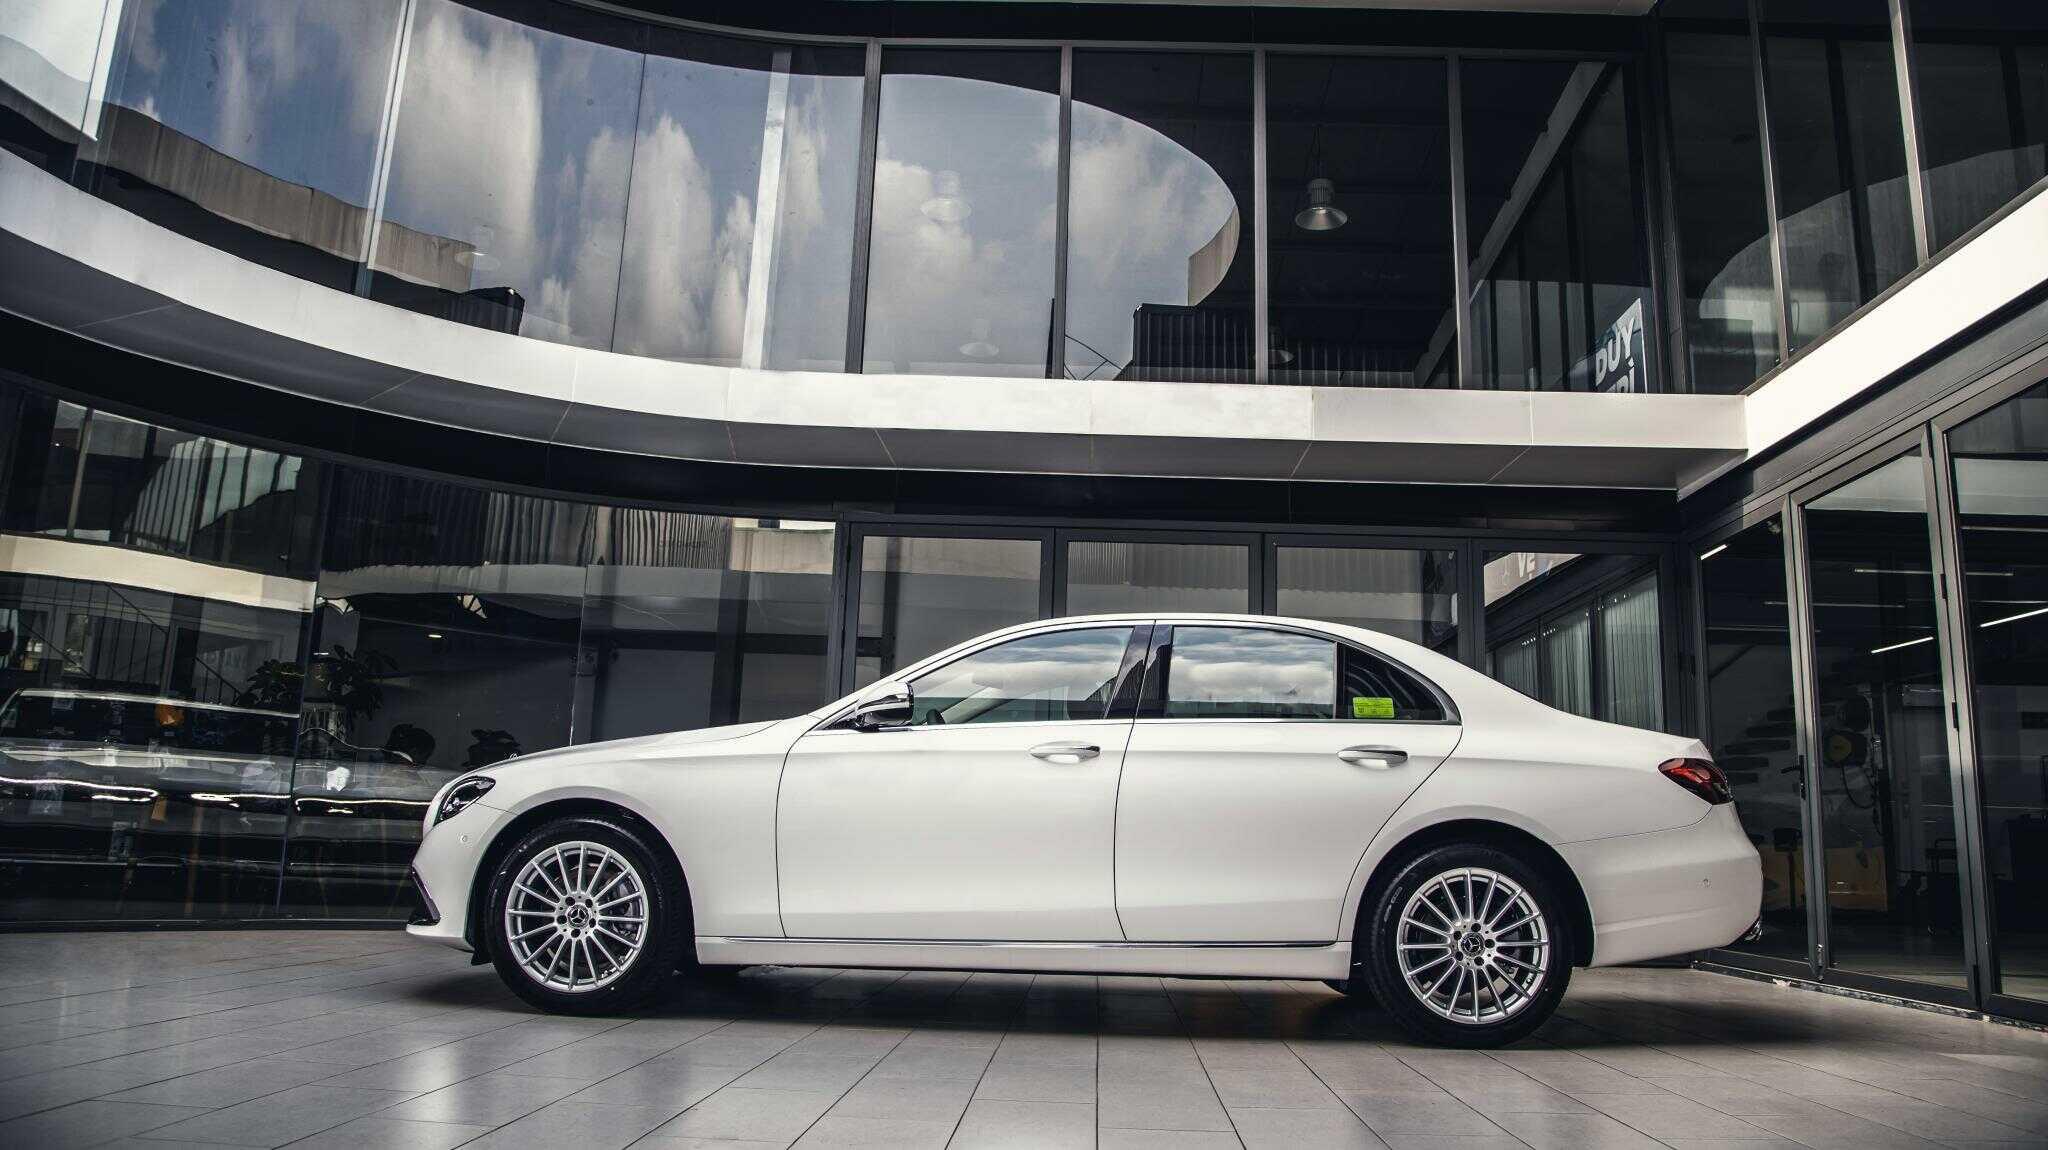 Giá lăn bánh xe Mercedes E200